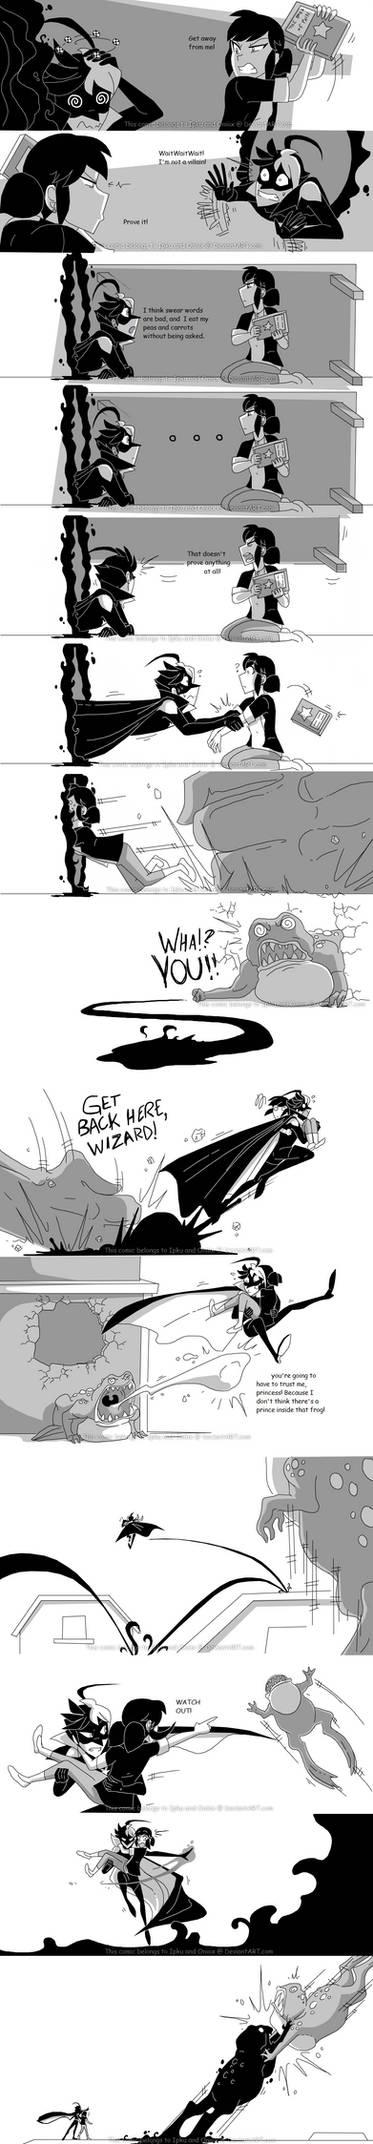 Ladybug meets Shadow's Tale - Page 5